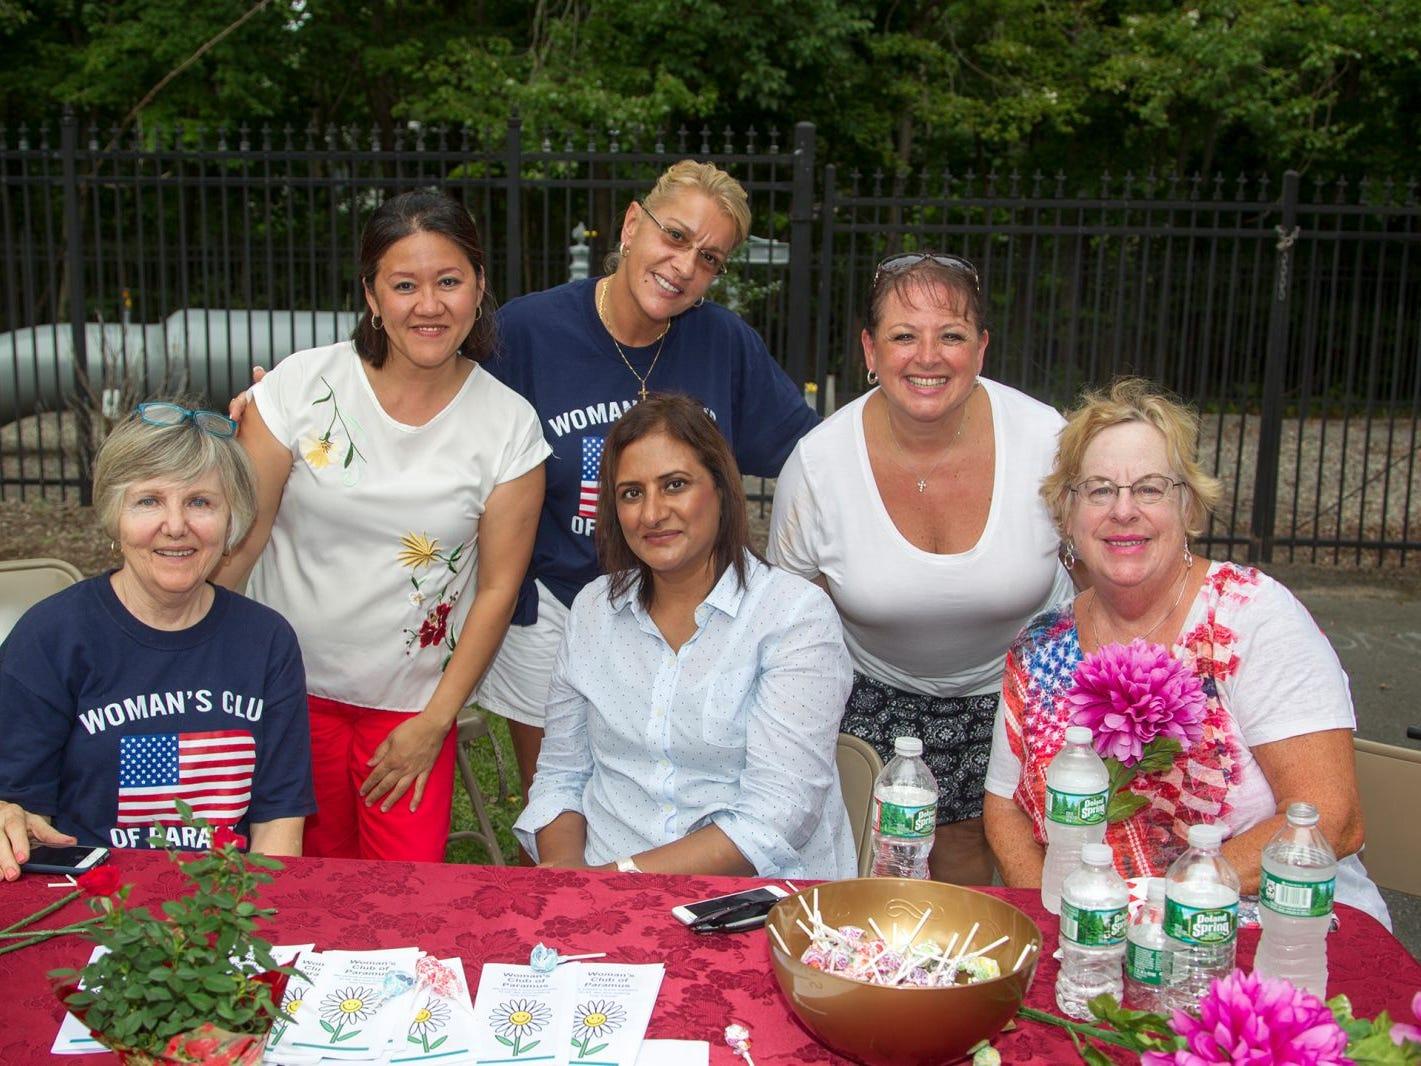 Womens Club of Paramus - Carol Cameron, Annie Mahmood, Susan Byrne, Lisa Corrado, Analiza Deleon. Paramus National Night Out 2018 behind Paramus Library. 08/07/2018